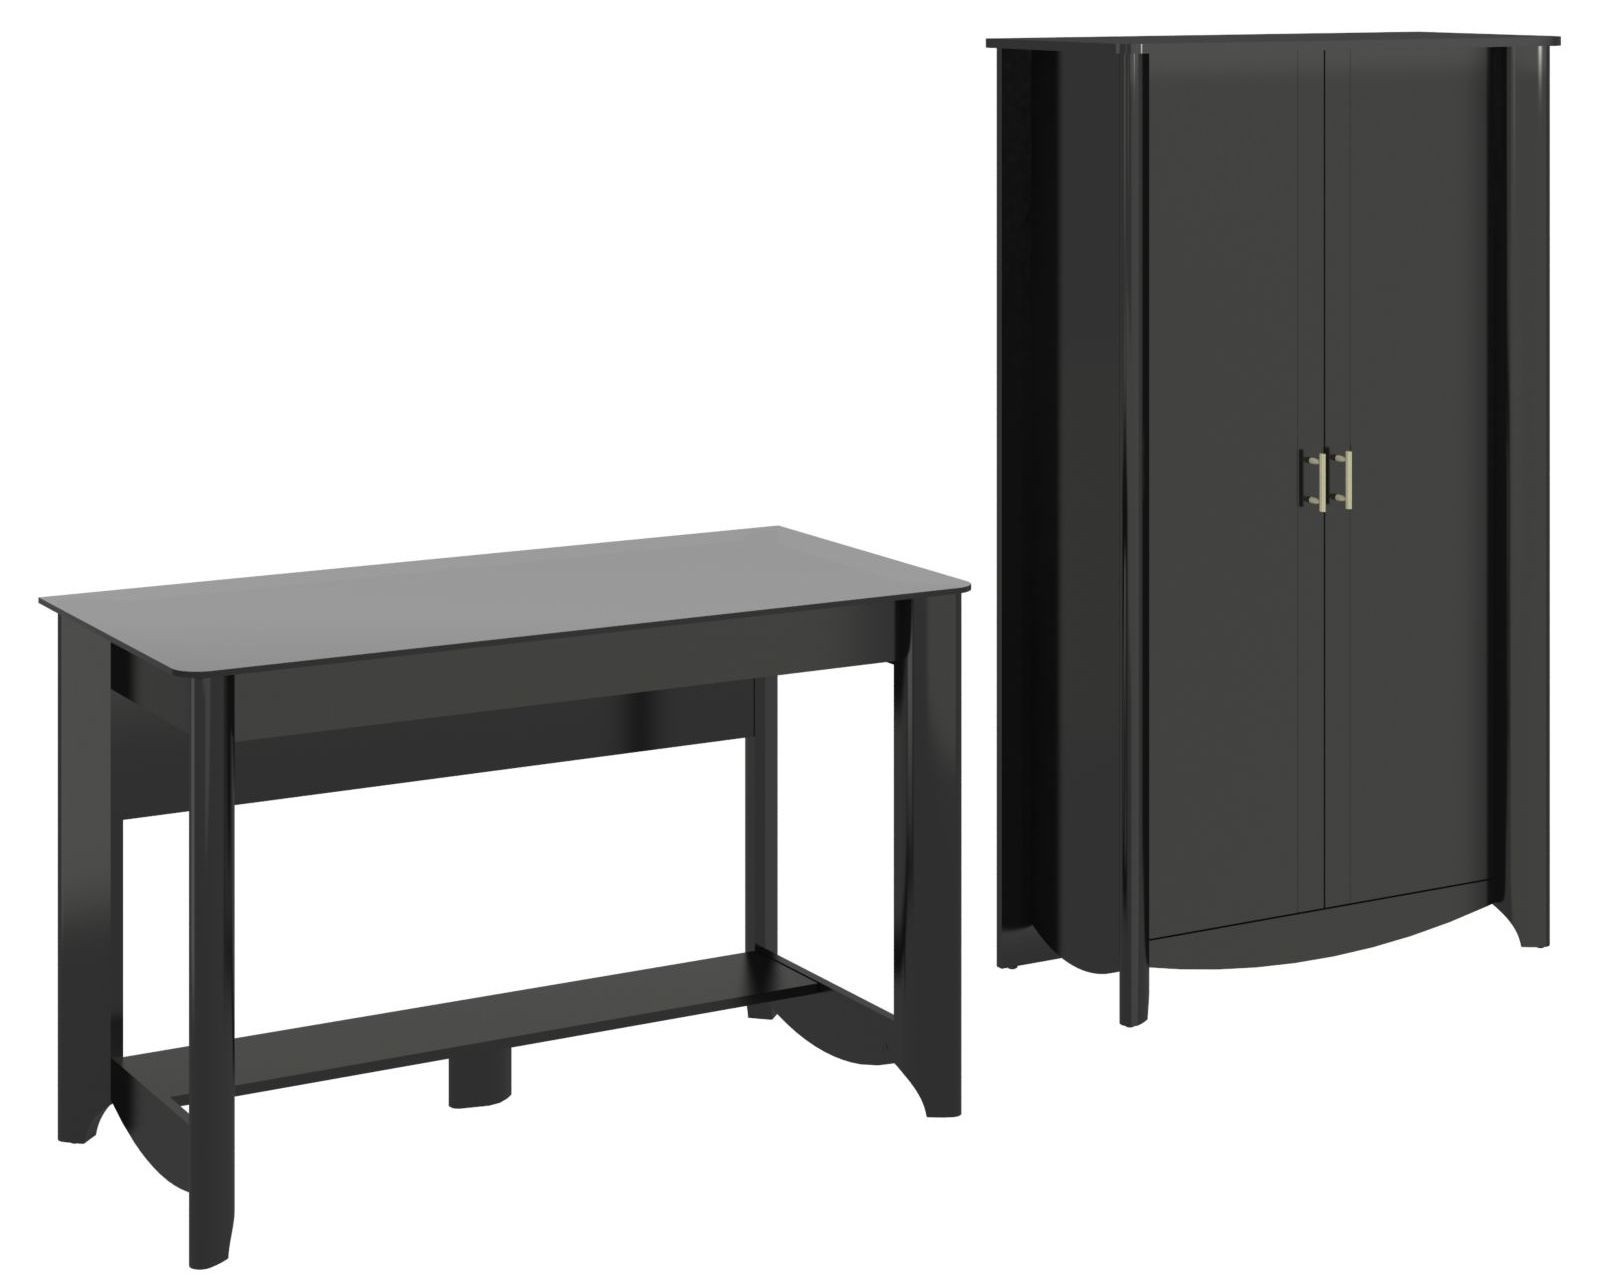 Aero Classic Black Desk With Tall Storage From Bush